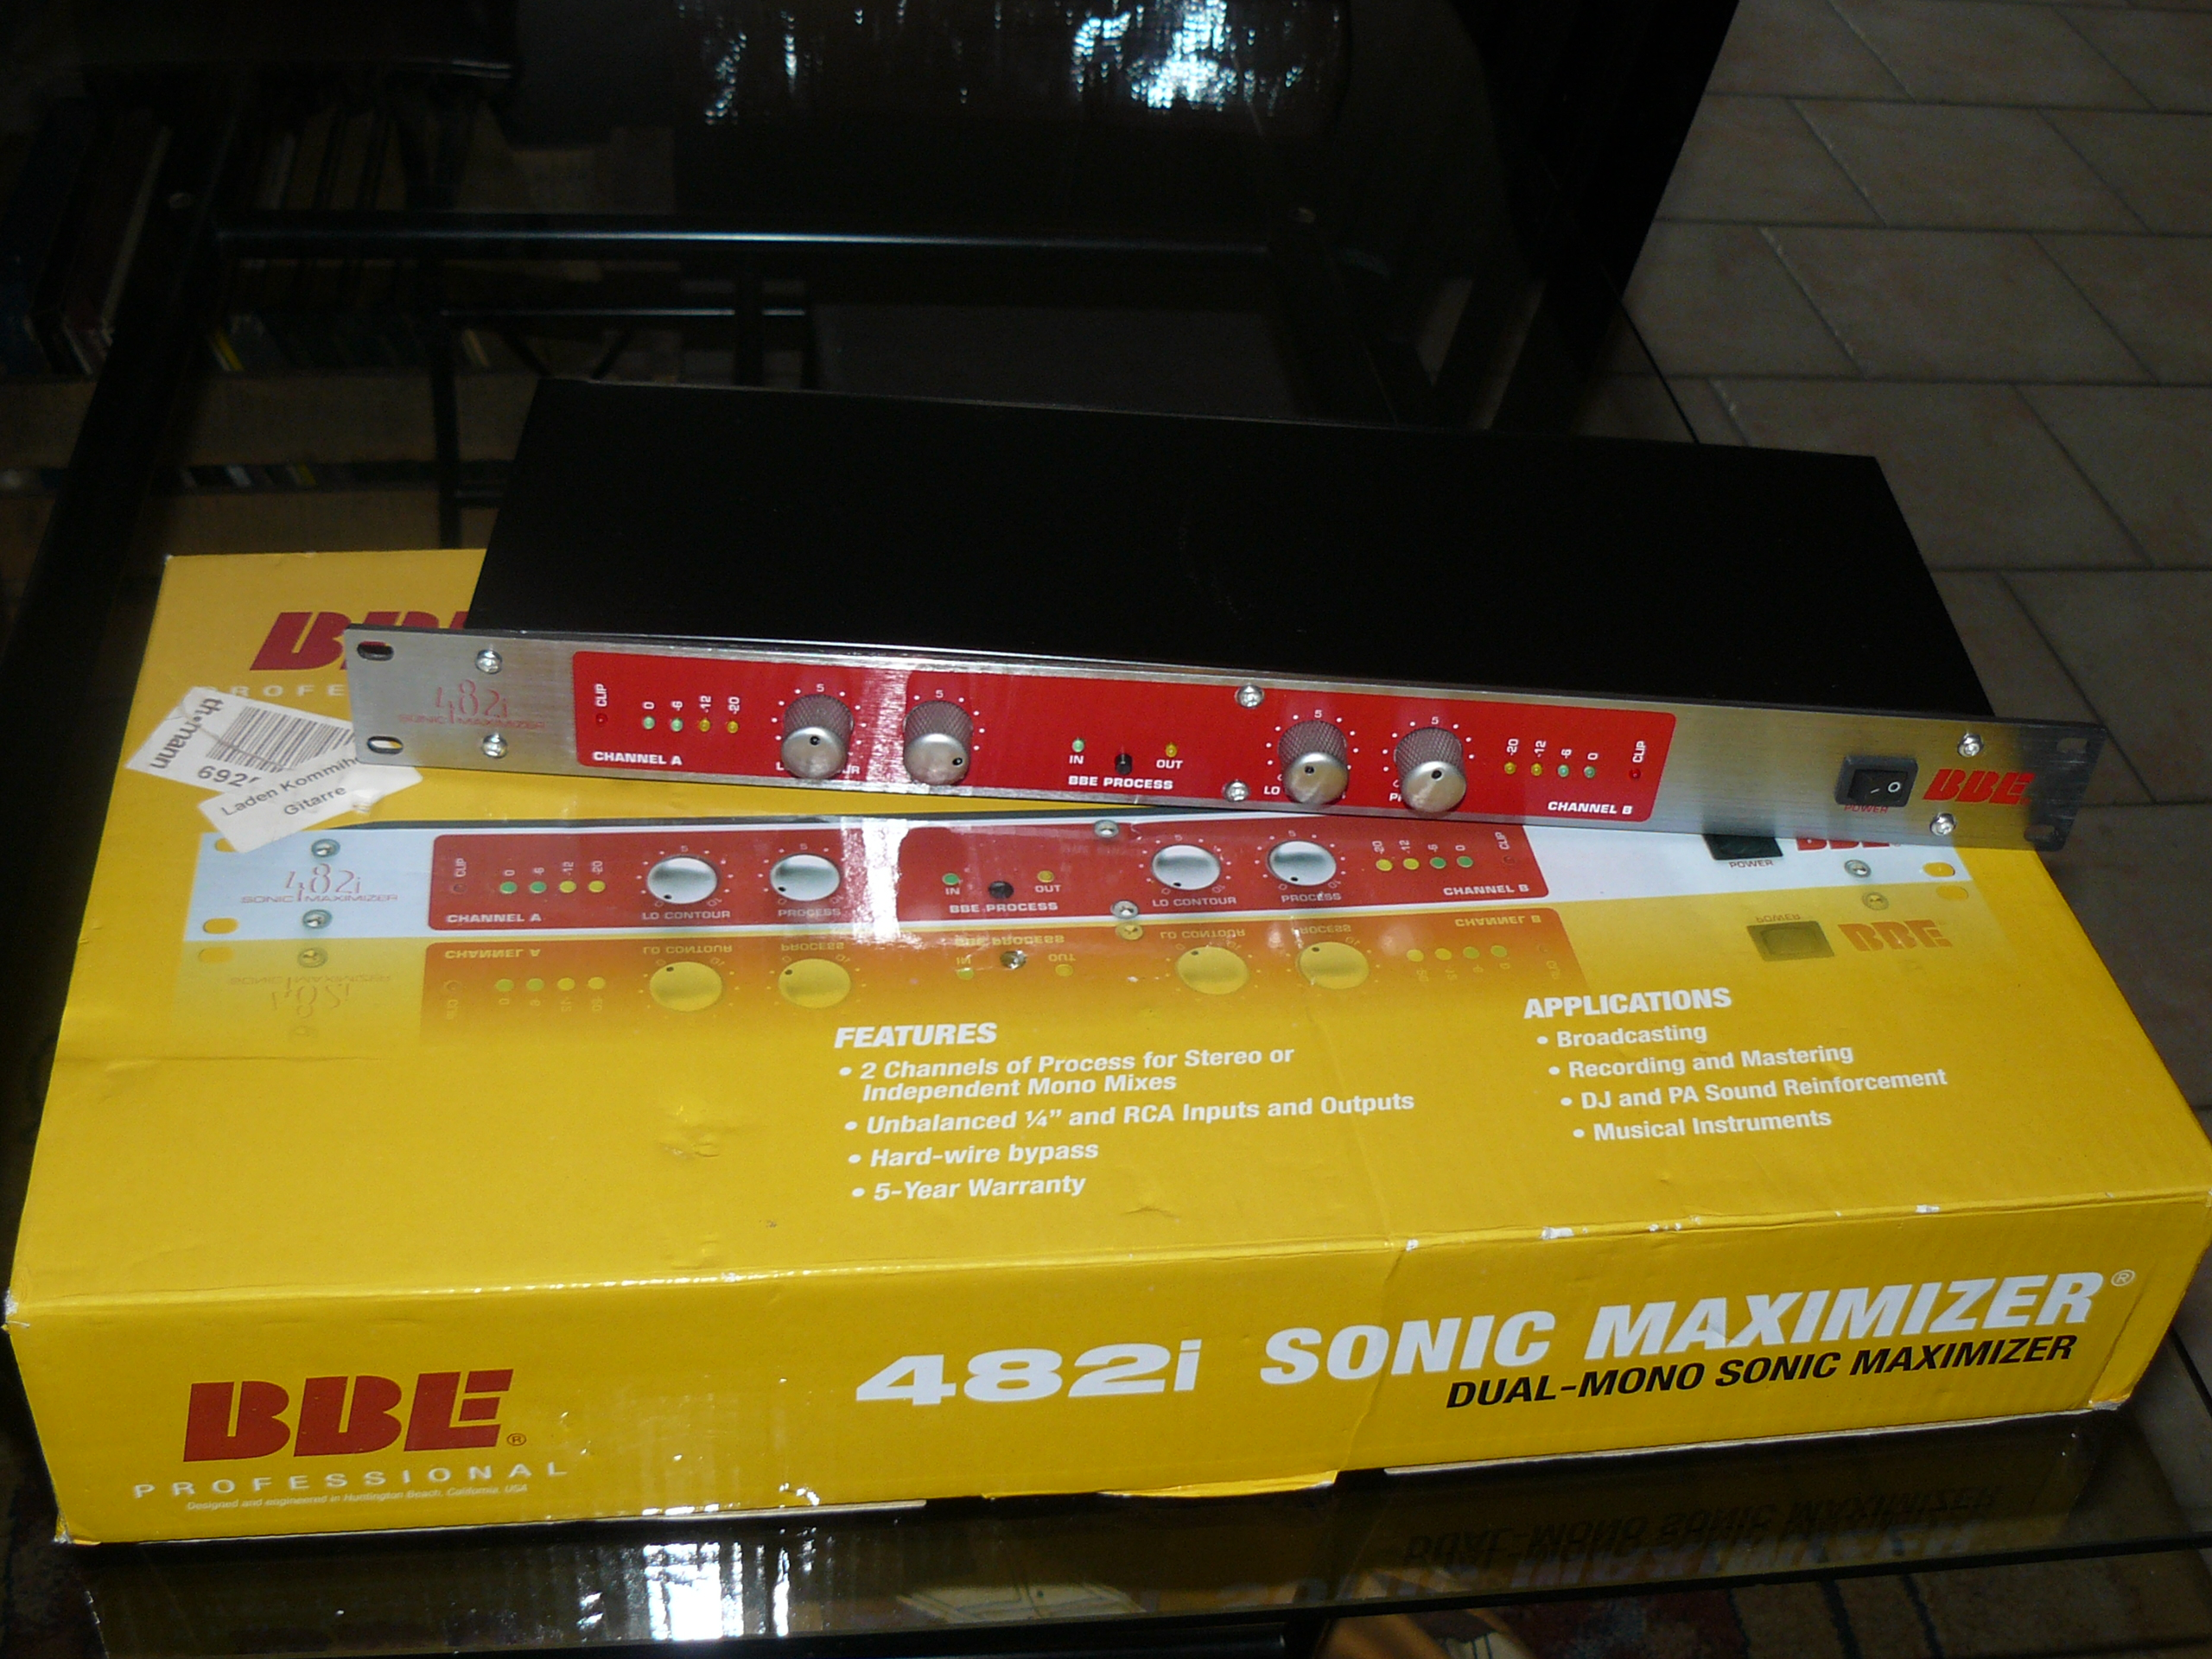 bbe sonic maximizer 482i image 1380807 audiofanzine. Black Bedroom Furniture Sets. Home Design Ideas